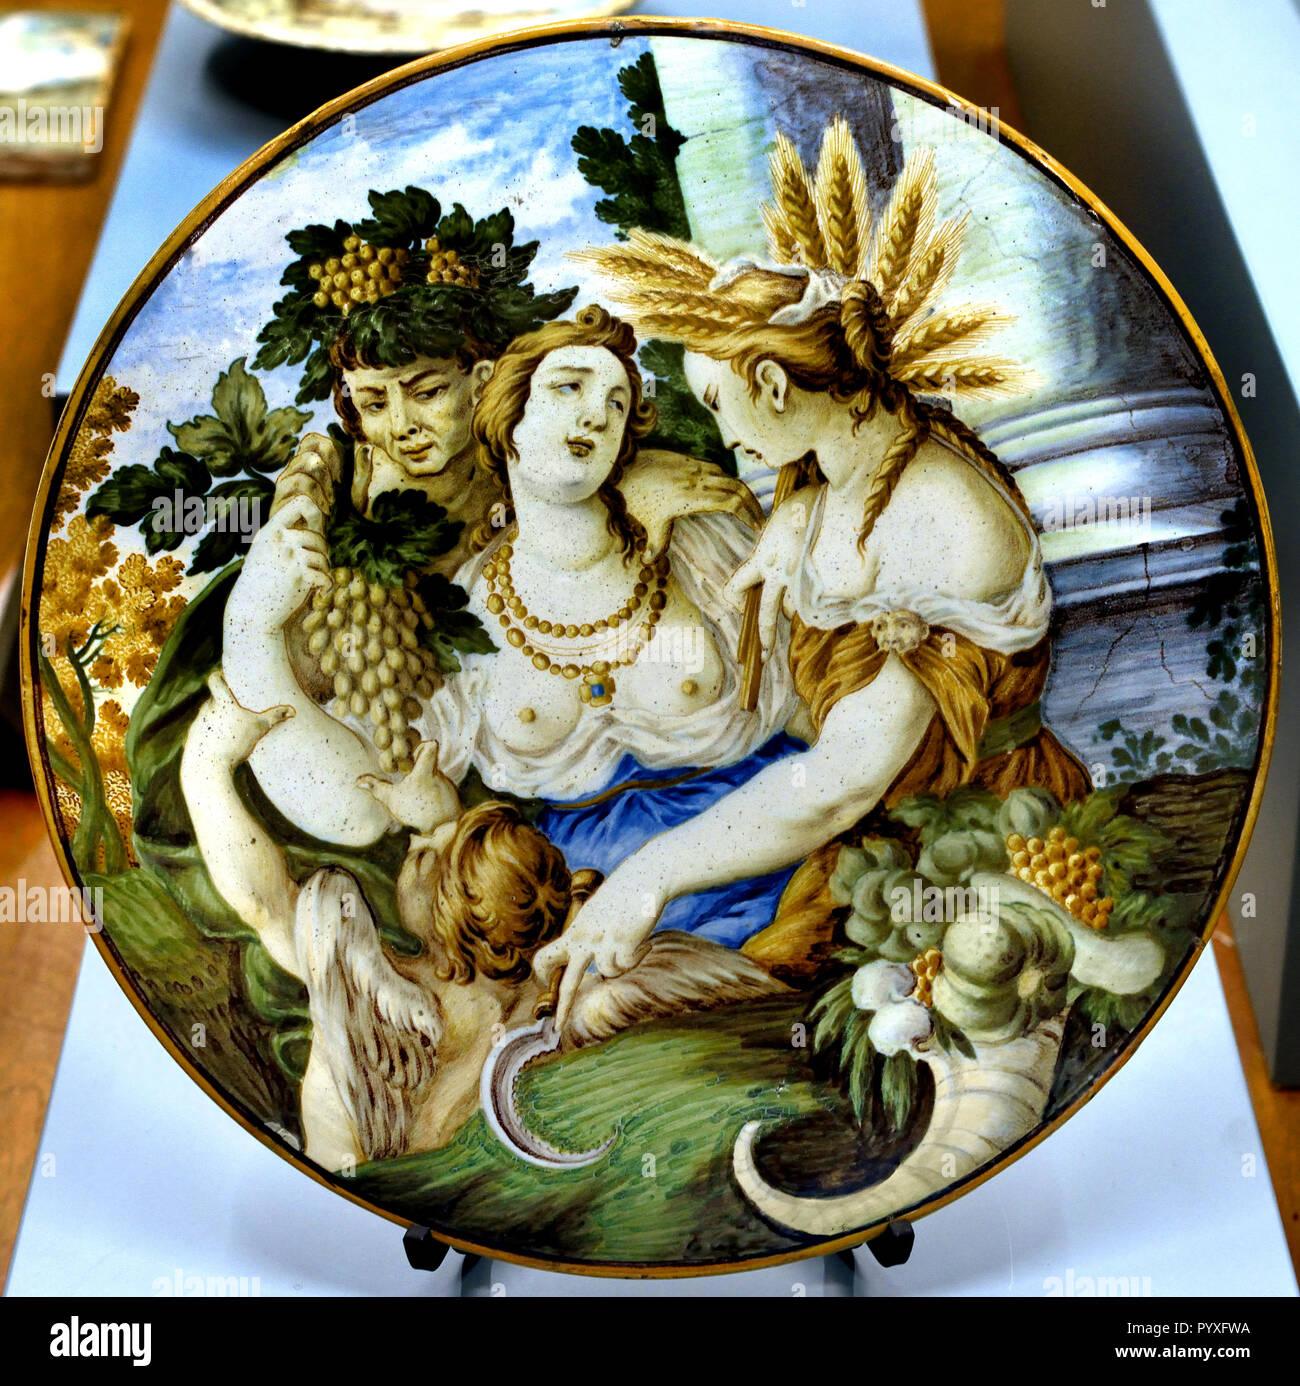 Tile with Venus, Bacchus and Ceres by Carmine Gentile, Castelli d` Abruzzo,  18th Century Museum of Ancient Art in the Castello Sforzesco - Sforza Castle in Milan Italy - Stock Image